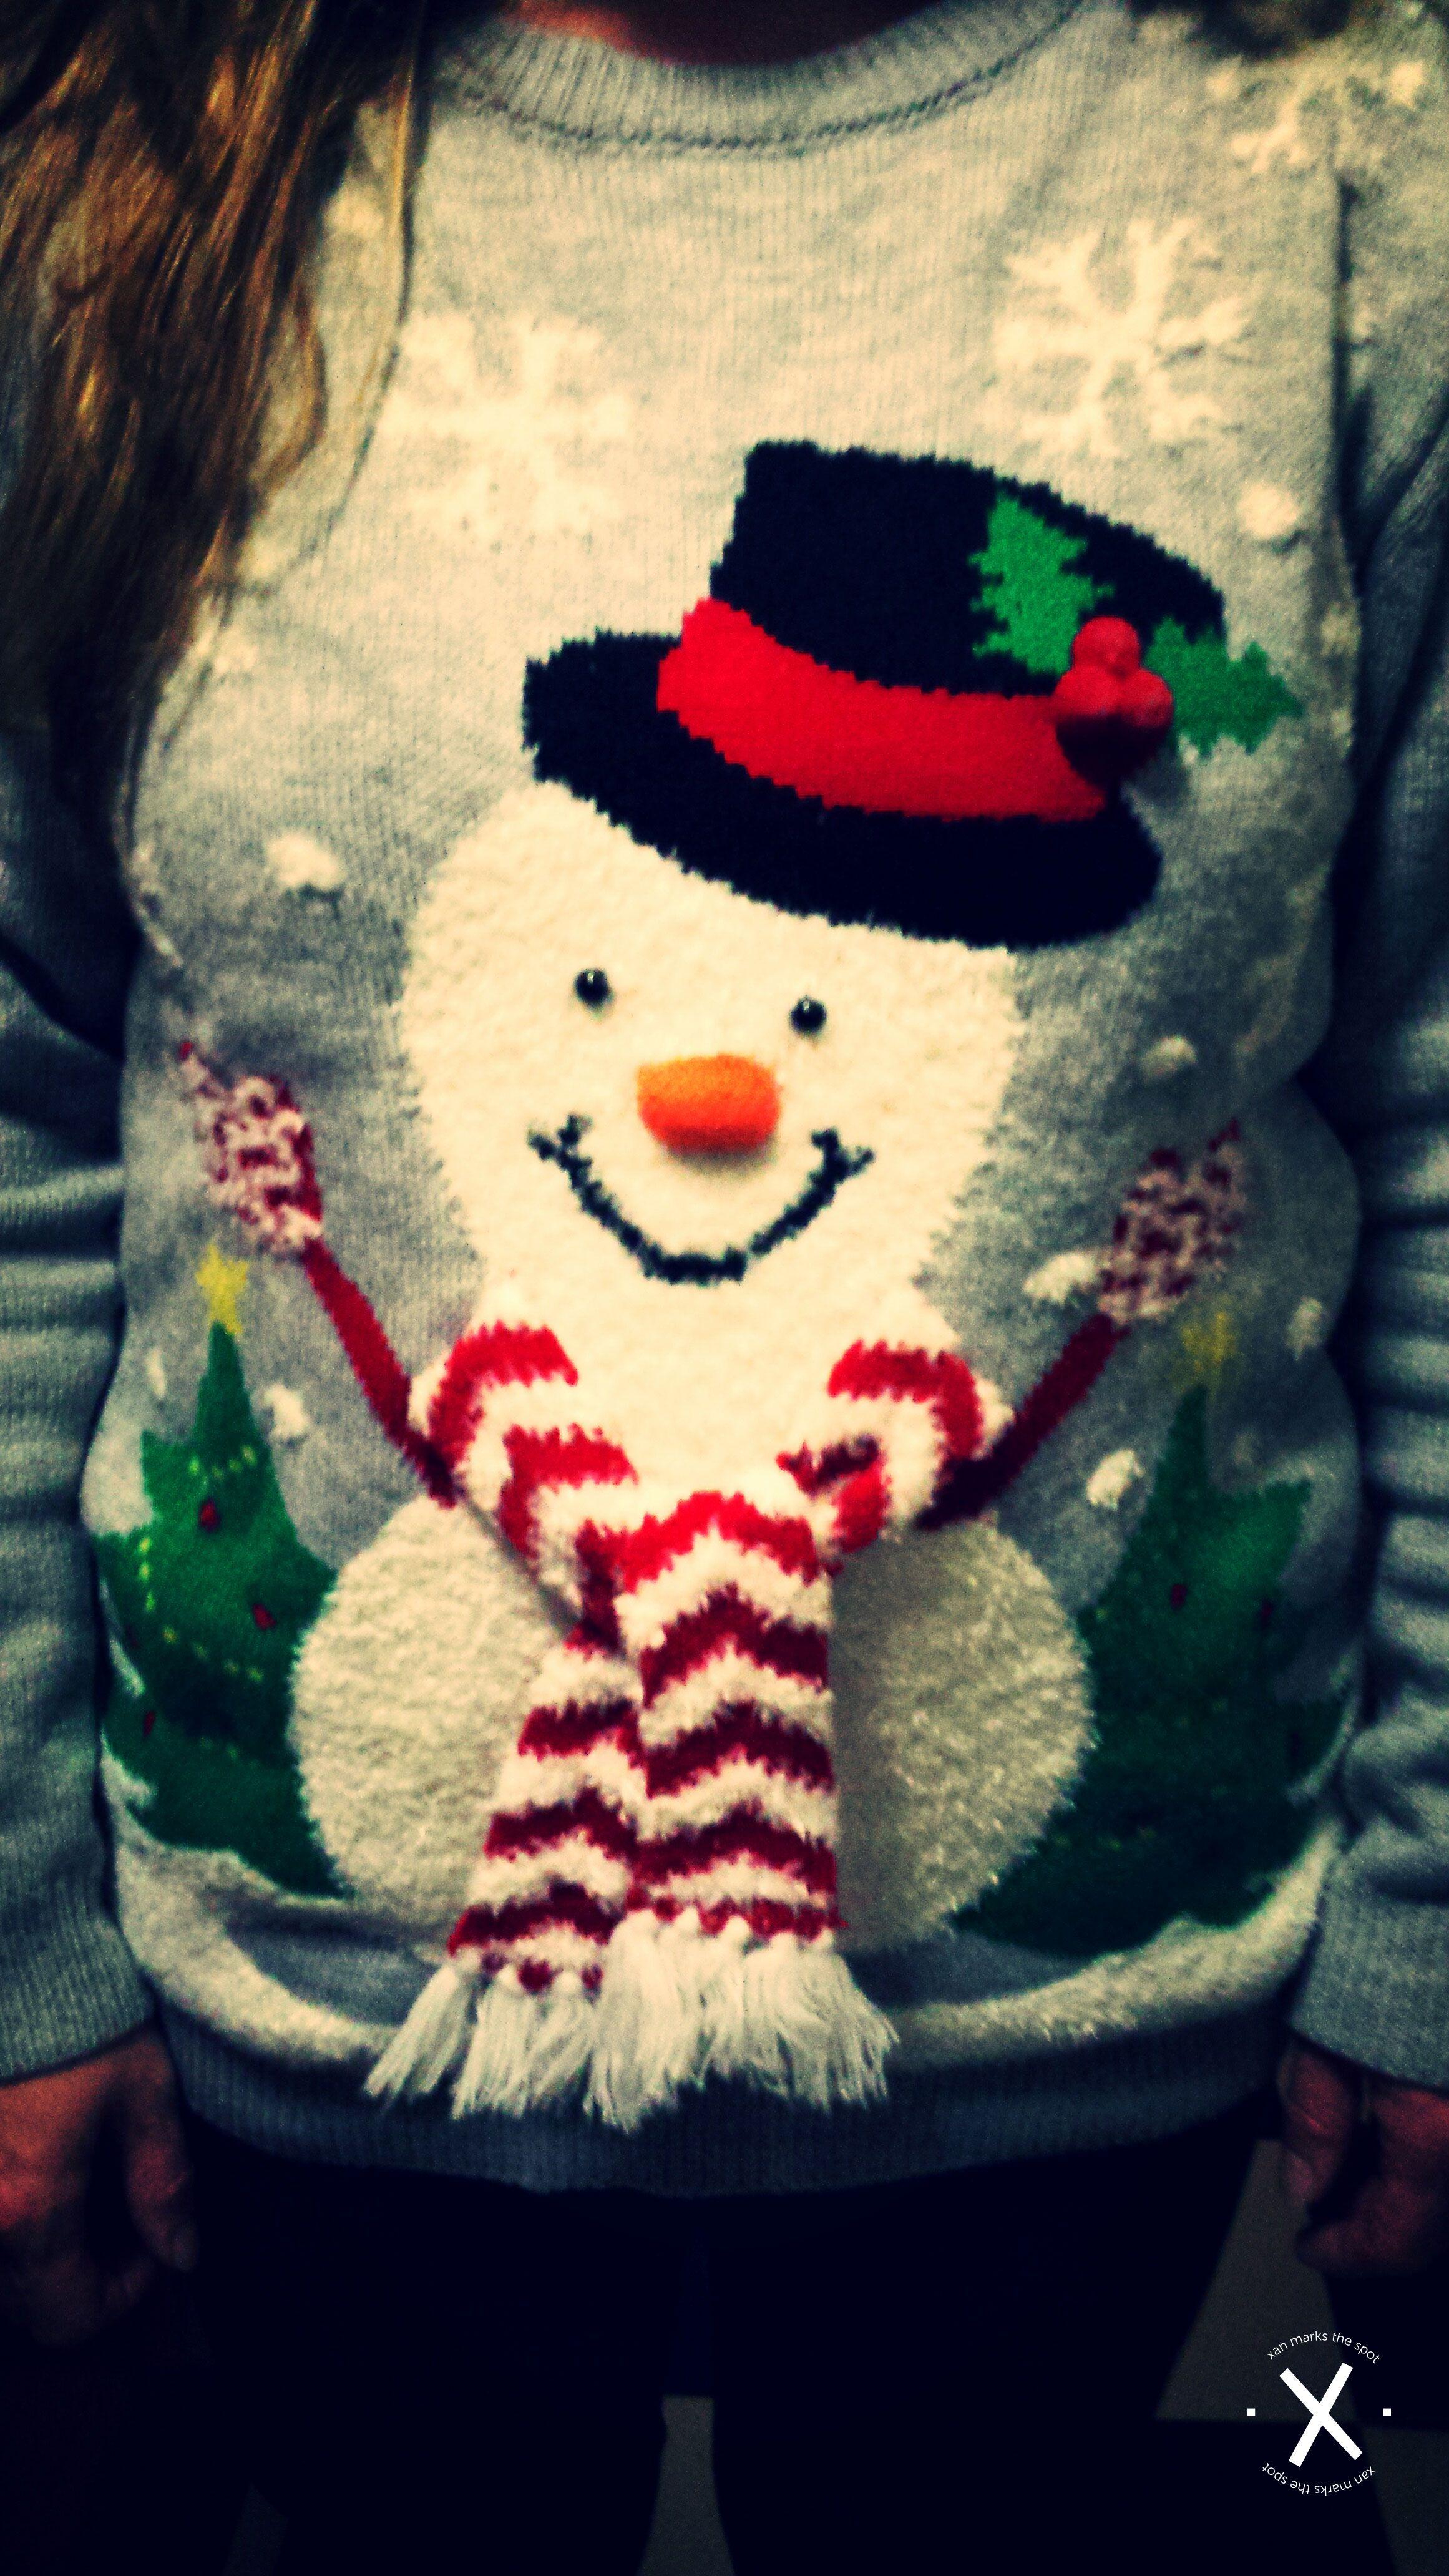 Foute Kersttrui Ah.Foute 3d Kersttrui Met Sneeuwpop Ah Excellent Kerstdiner Vesyolyj